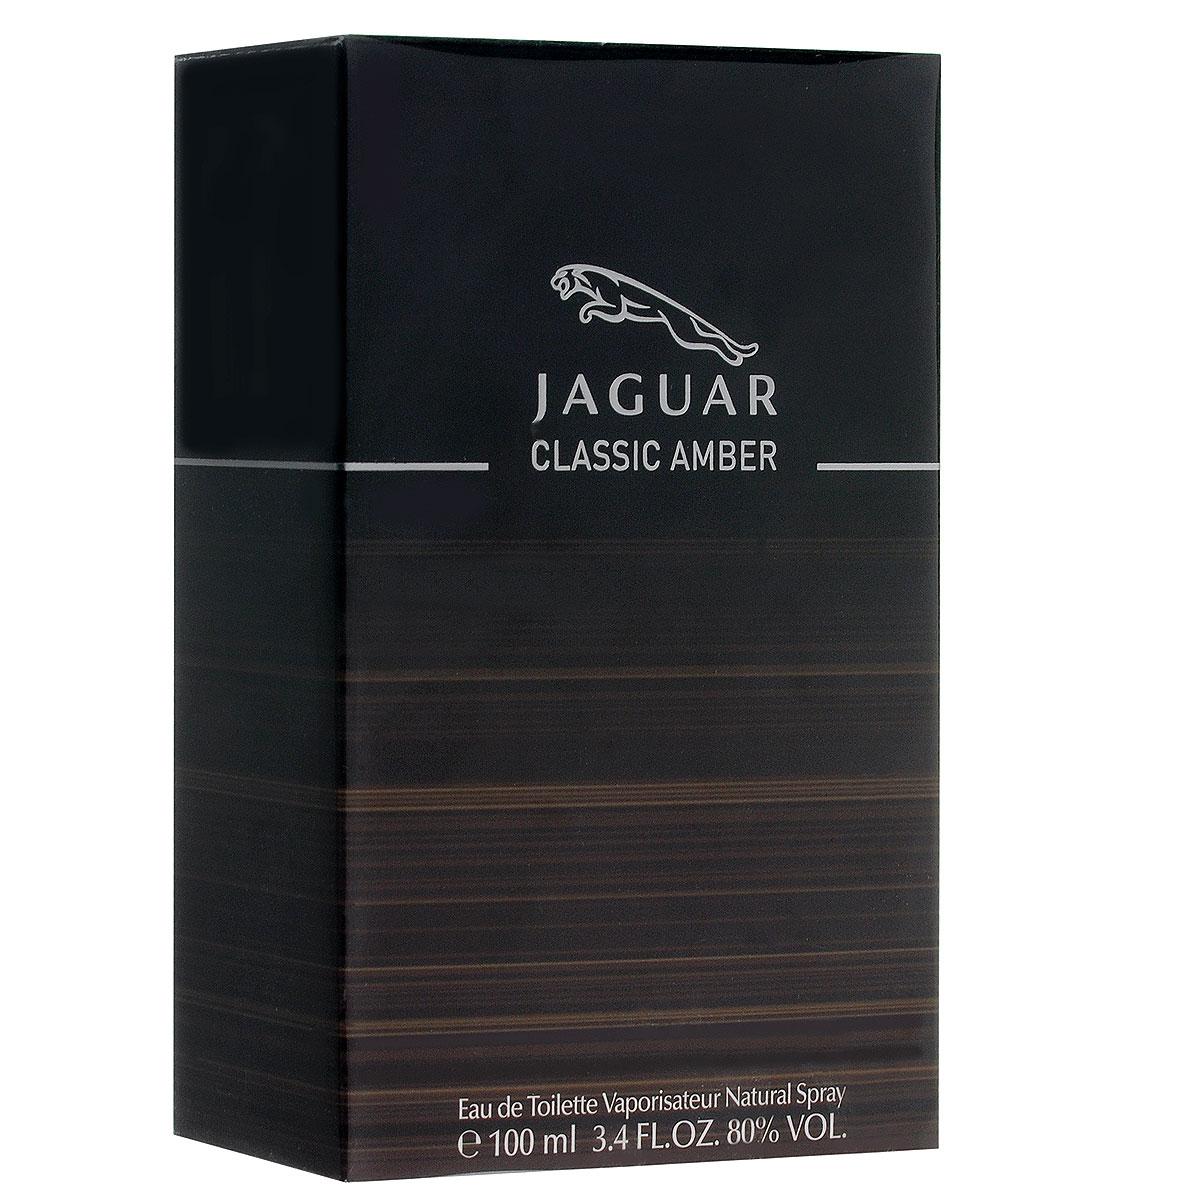 Jaguar Туалетная вода Classic Amber, мужская, 100 мл туалетная вода s oliver туалетная вода s oliver superior man 30 мл